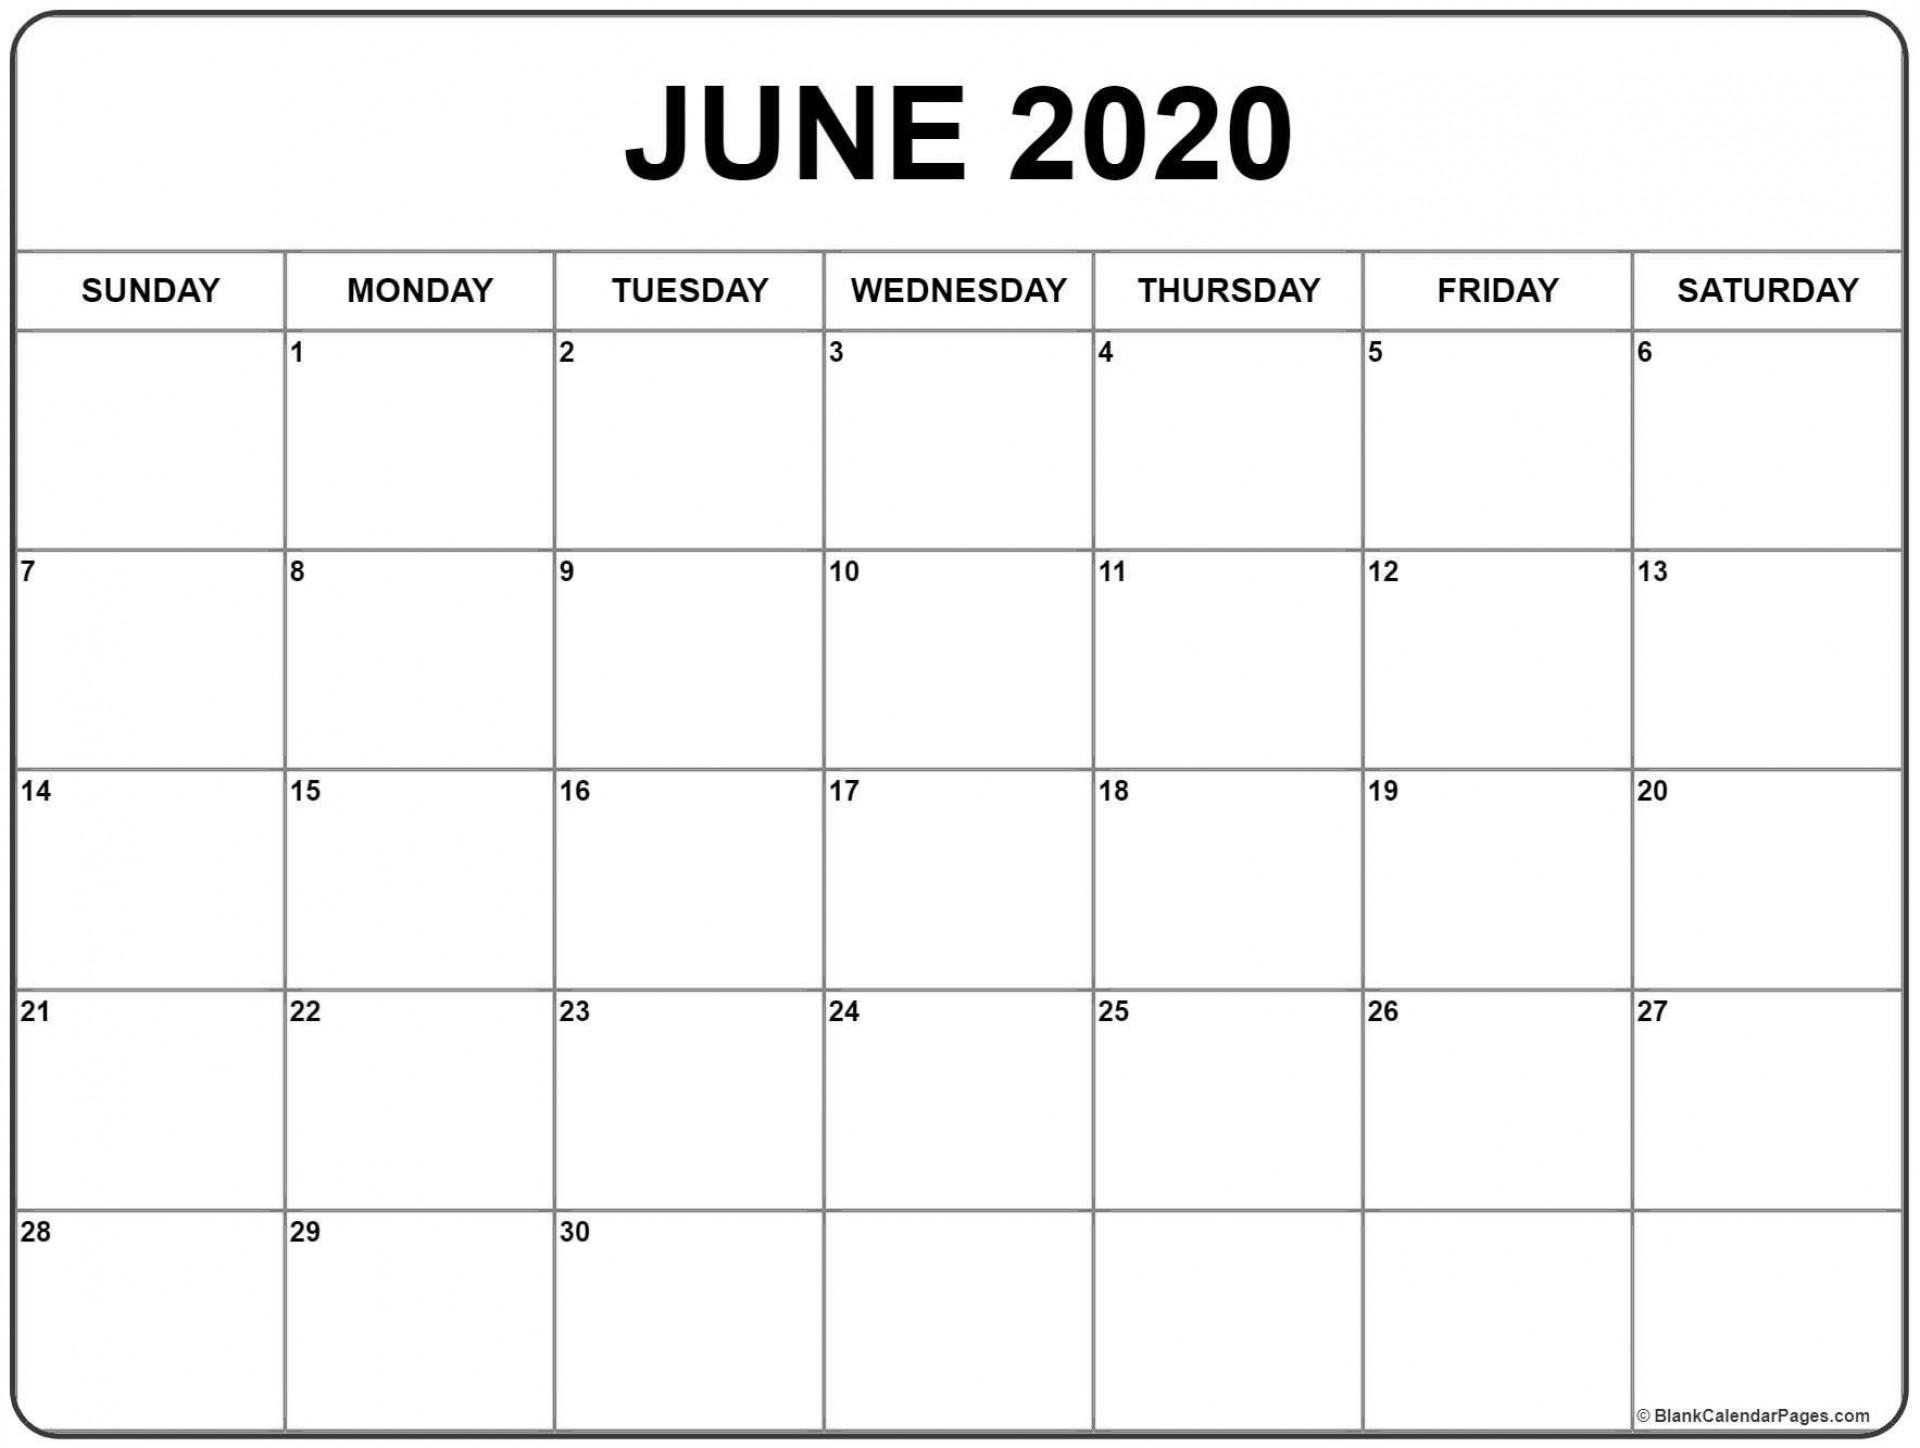 000 Unbelievable June 2020 Monthly Calendar Template Image 1920